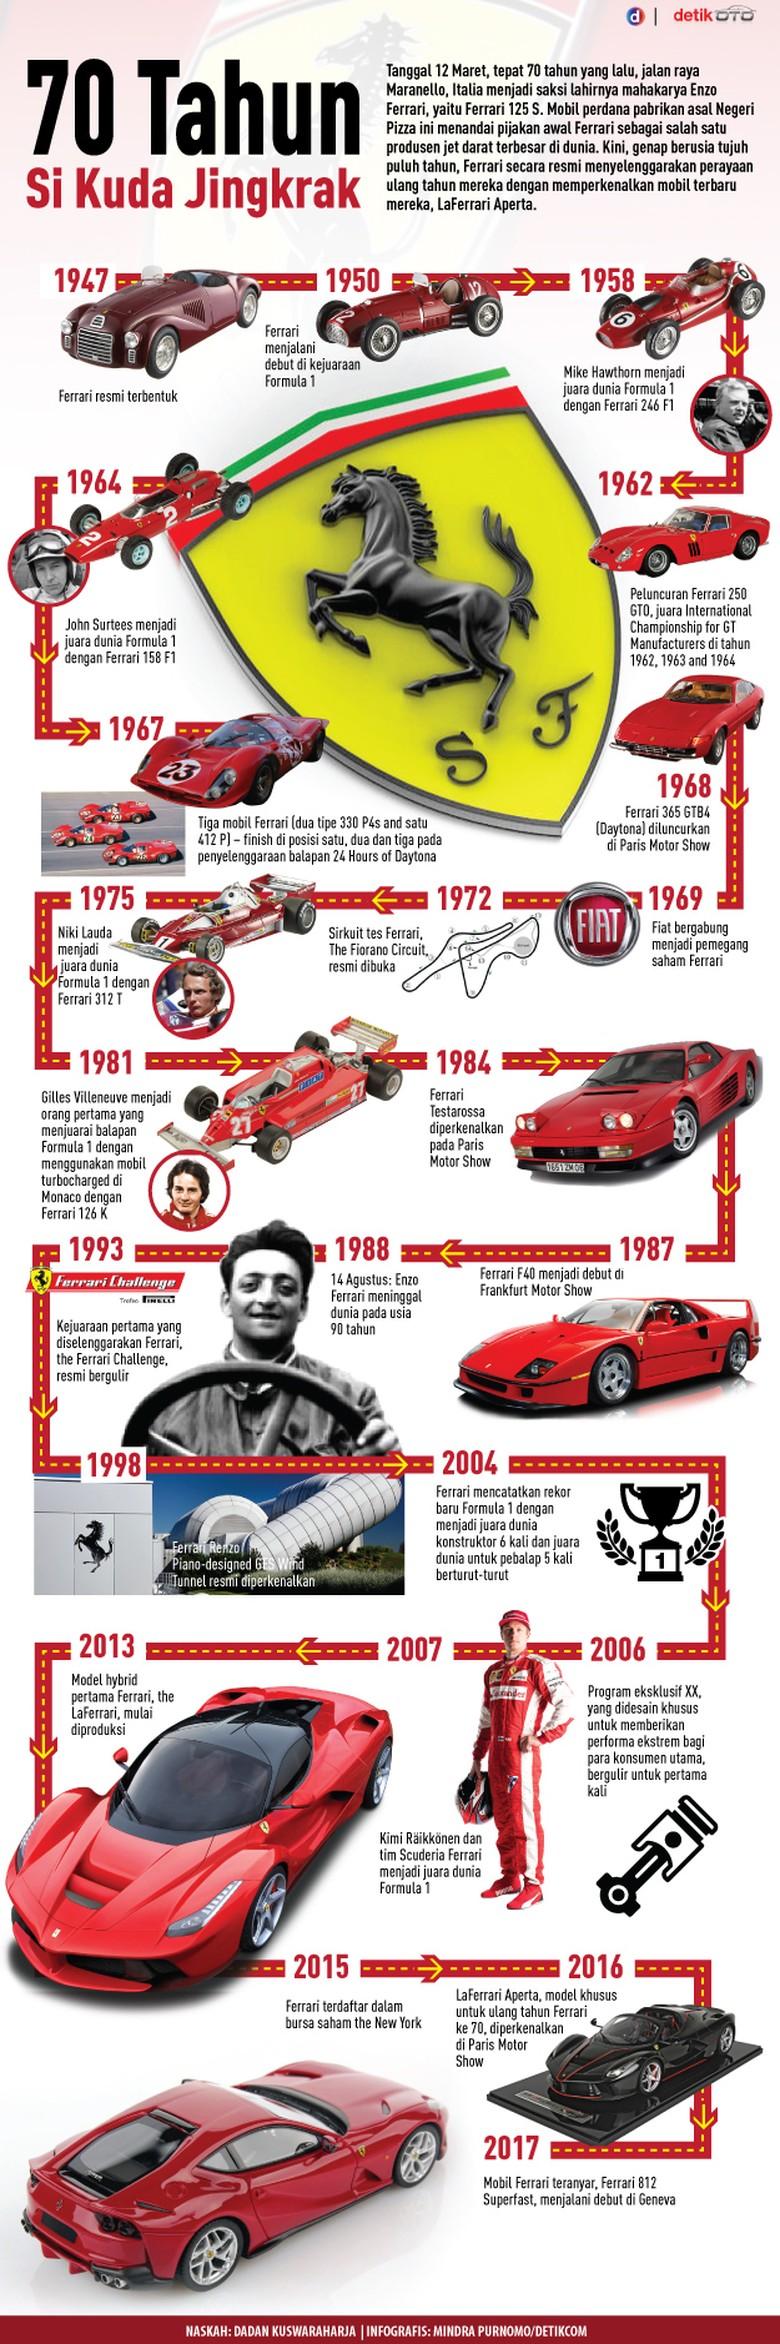 70 Tahun Si Kuda Jingkrak Ferrari